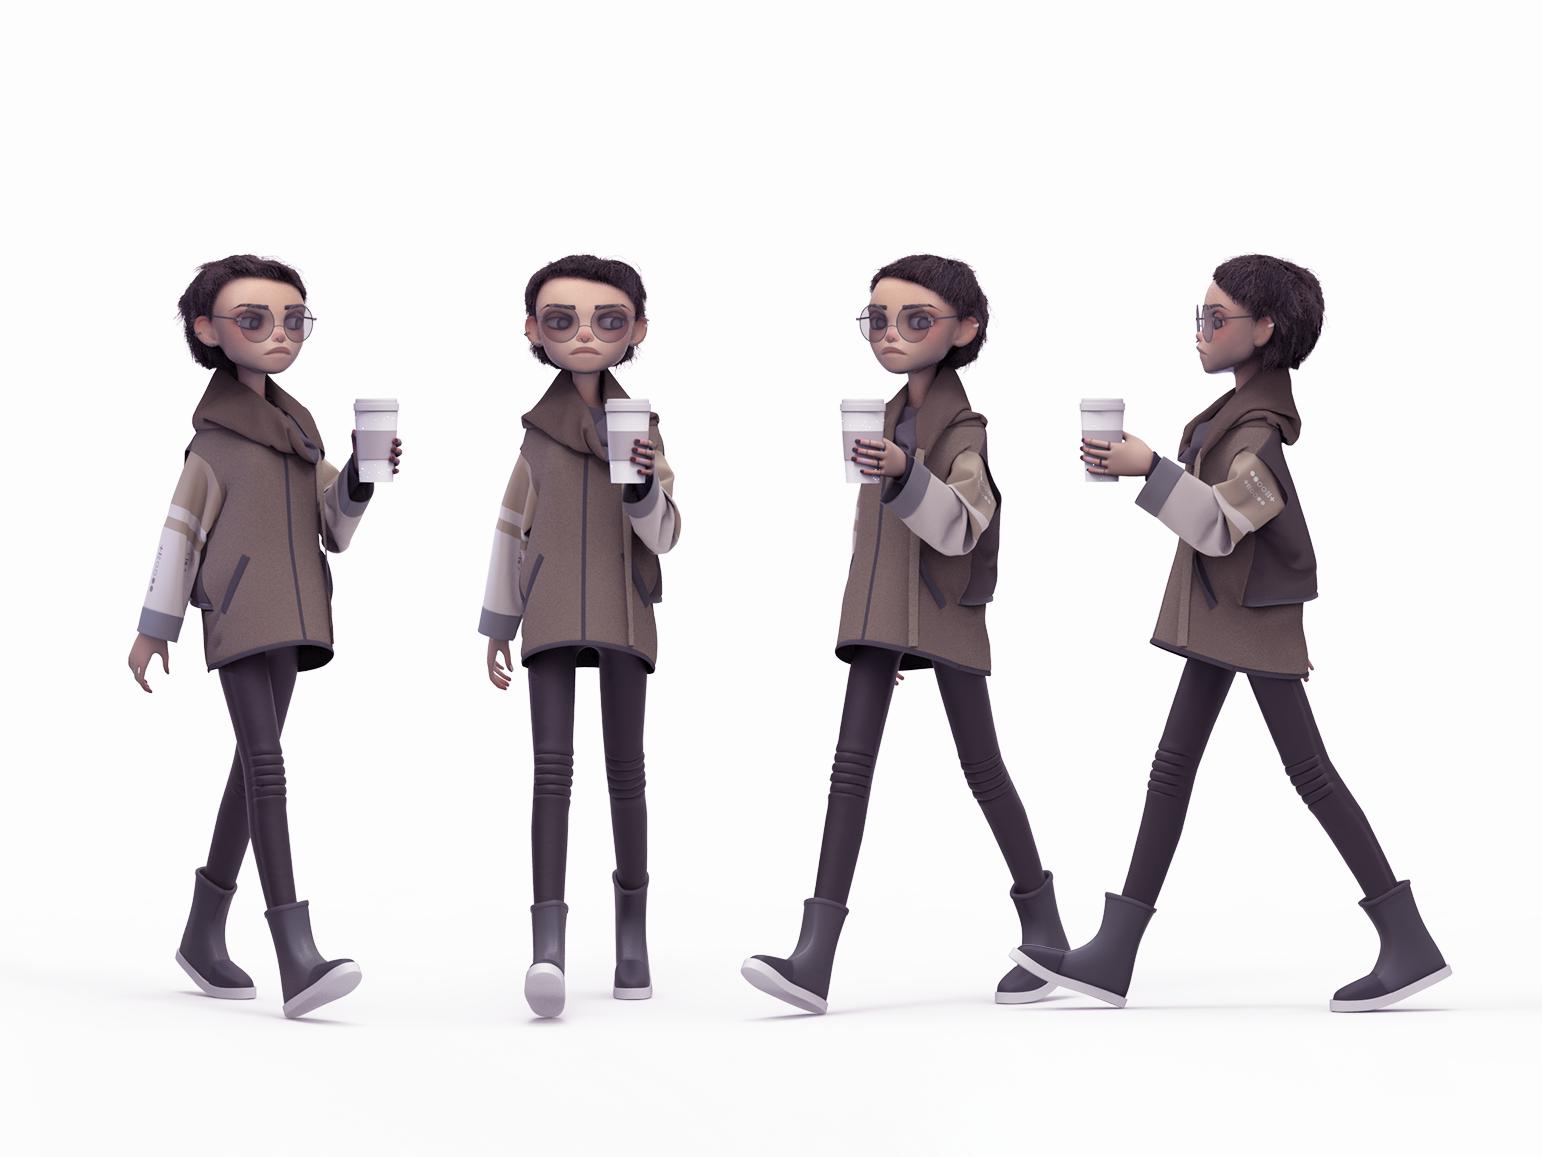 Shimuko zbrush girl 3d character design character shimur